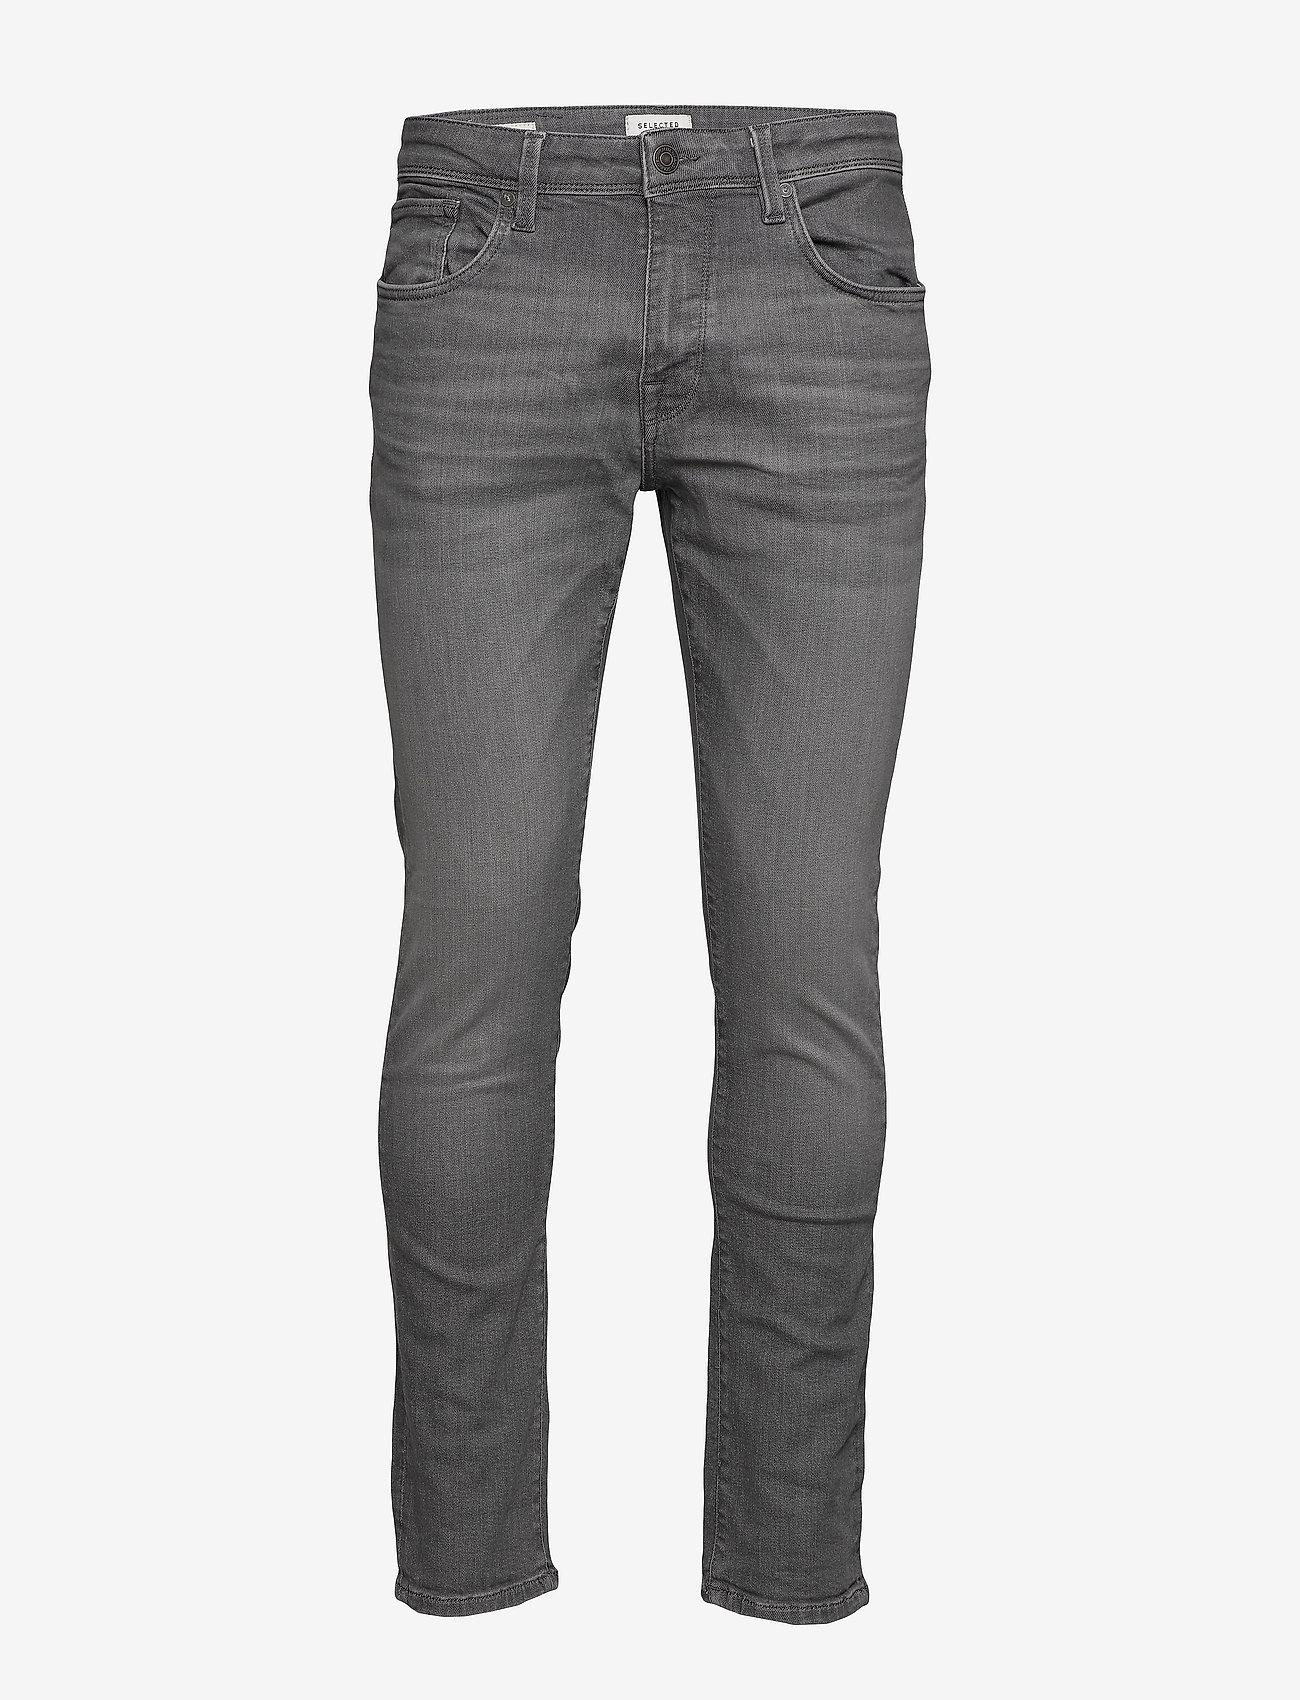 Selected Homme - SLHSLIM-LEON 6213 MGR SU-ST JEANS W NOOS - slim jeans - grey denim